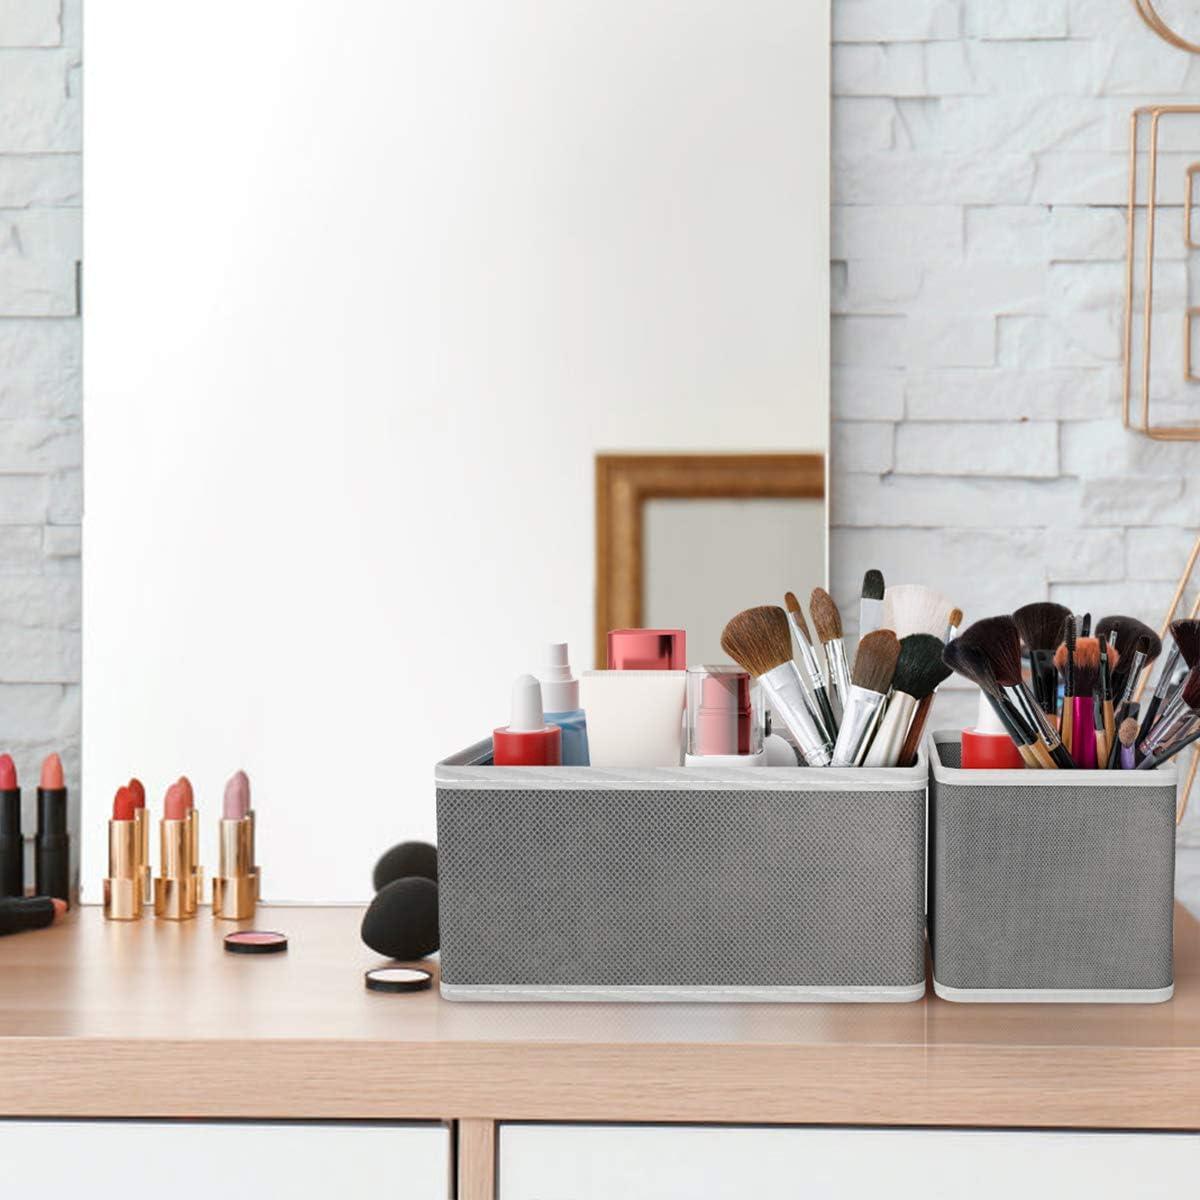 Grey Drawer Organiser Storage Box for Wardrobe Closet Cabinet Cupboard Dresser Foldable Fabric Storage Boxes Drawer Dividers Insert for Clothes Bras Underwear Socks Ties Toys Bathroom Set of 9